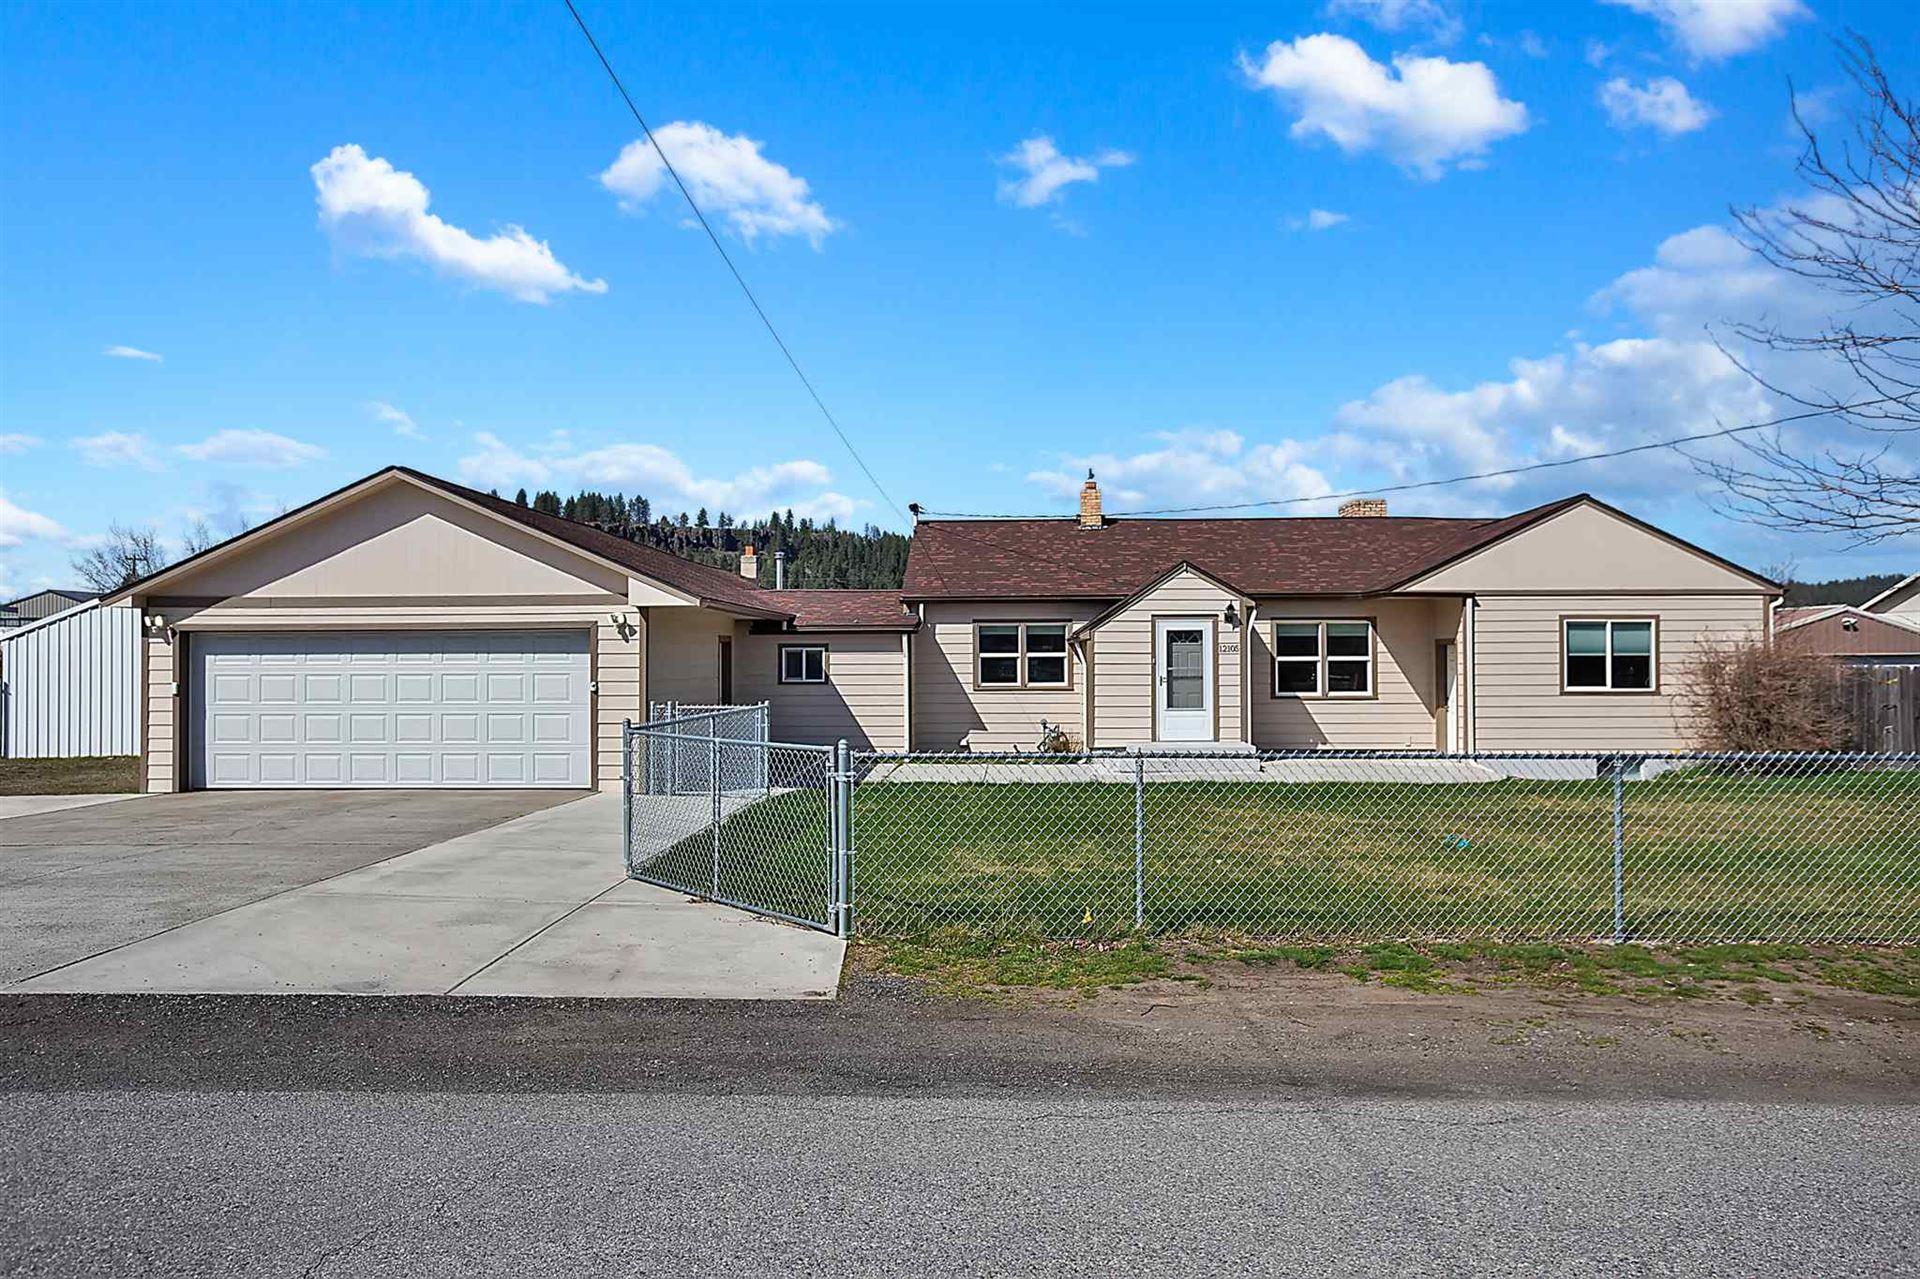 12105 E Portland Ave, Spokane Valley, WA 99206 - #: 202113657